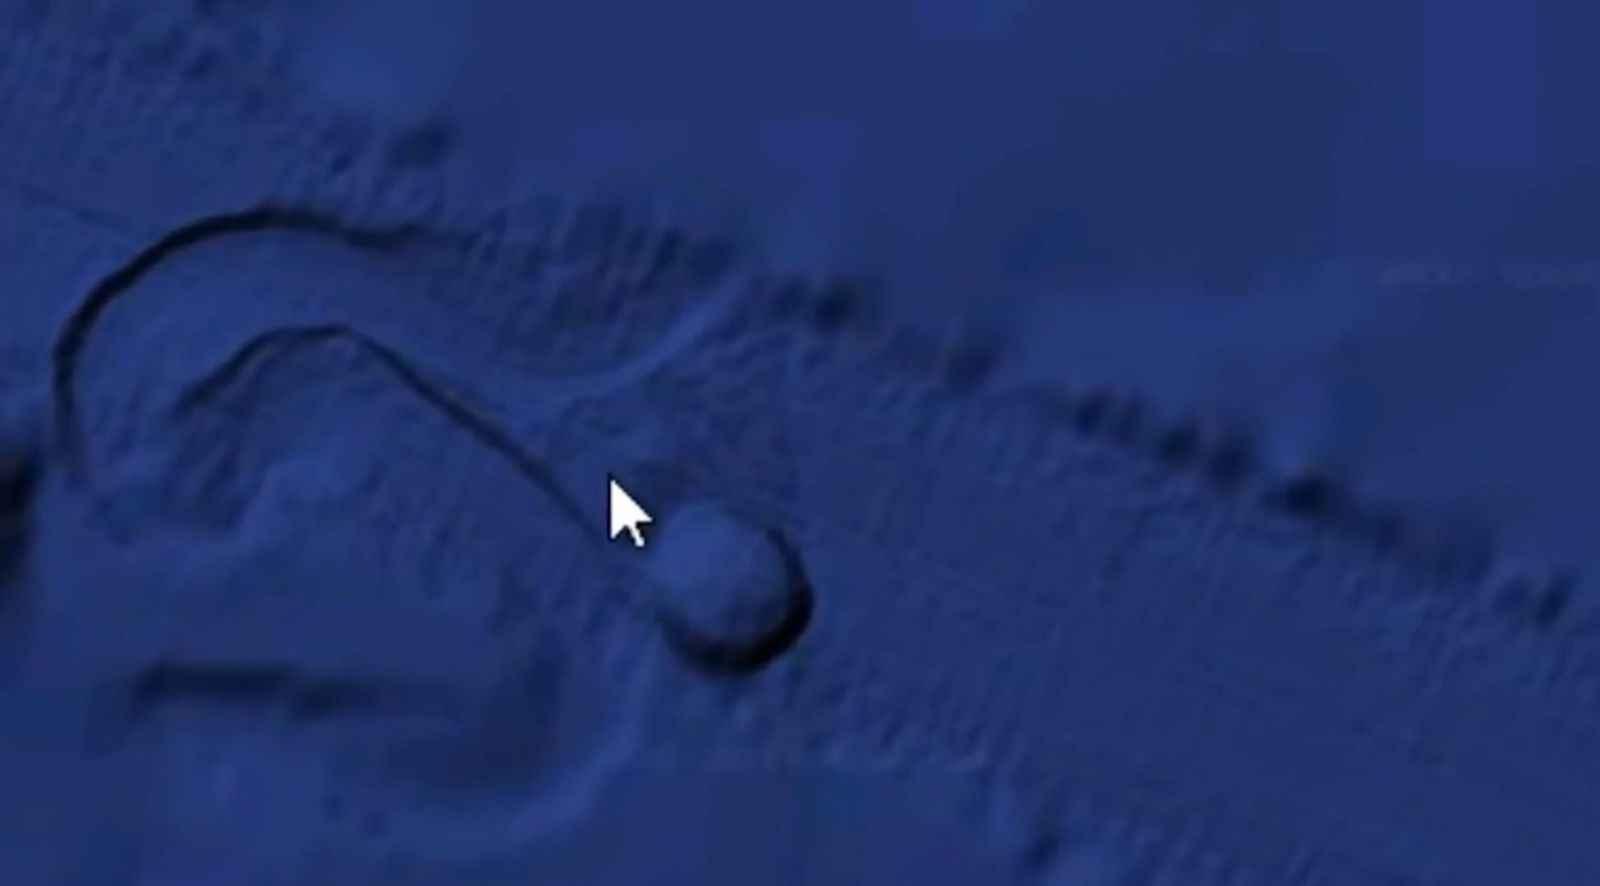 7b_undersea_ET_exploration_craft.jpg